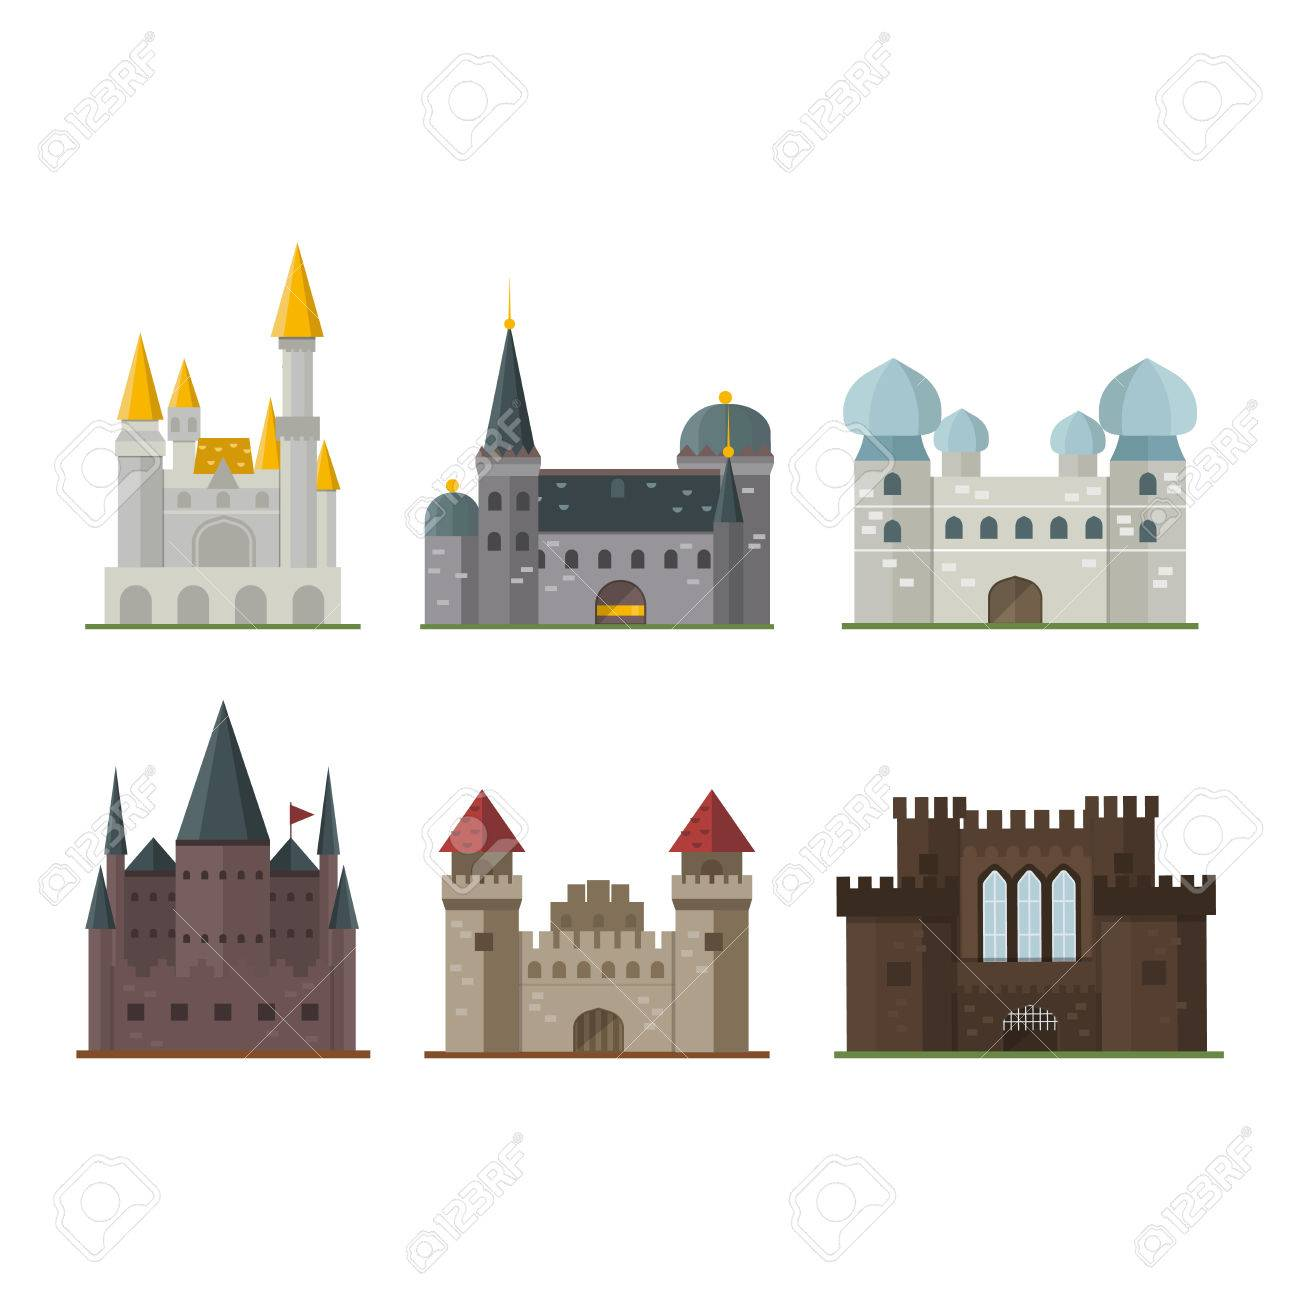 Cartoon fairy tale castle tower icon. Cute cartoon castle architecture. Vector illustration fantasy house fairytale medieval castle. Kingstone cartoon castle cartoon stronghold design fable isolated. - 61211933